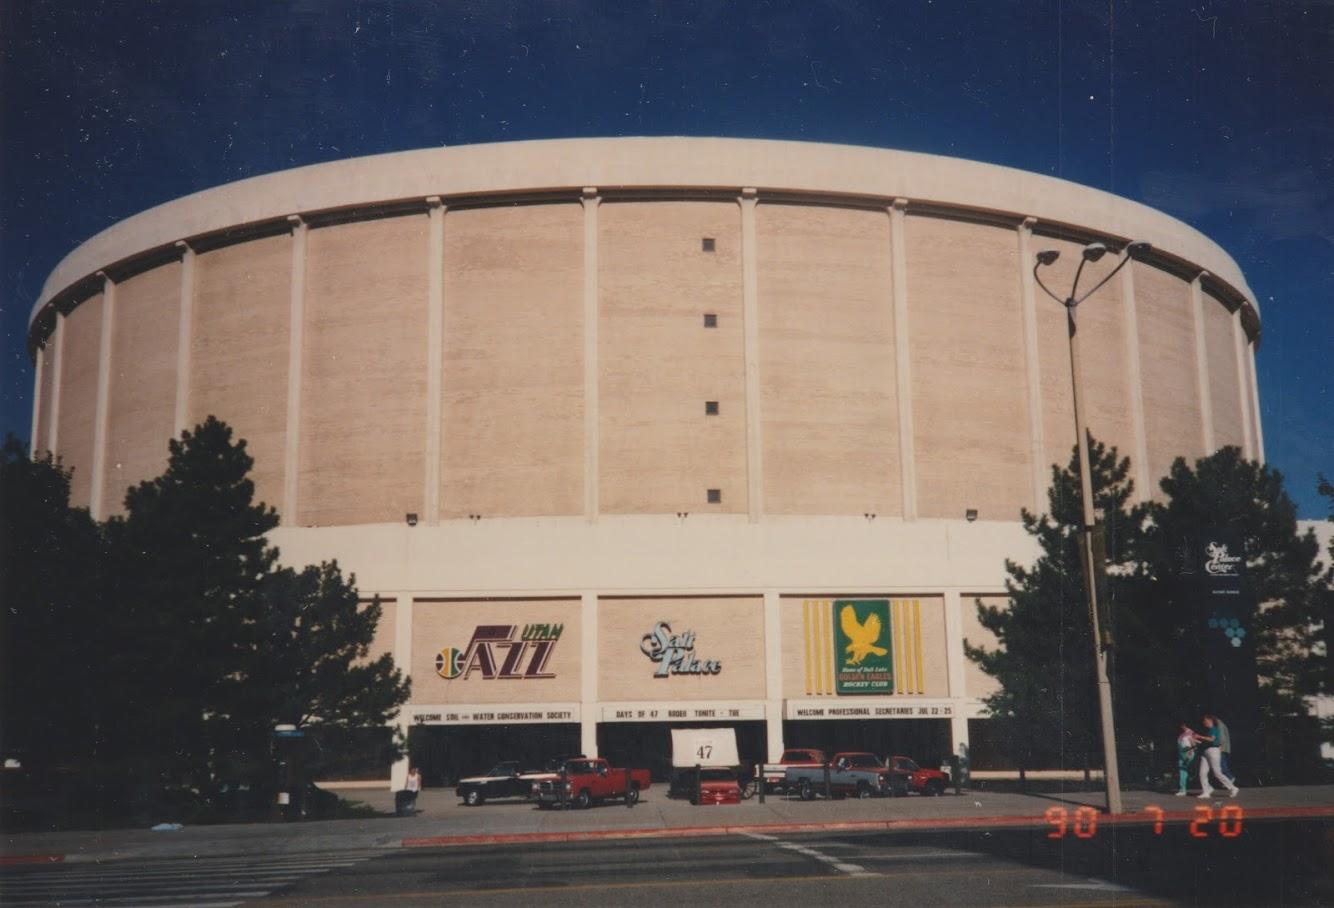 hot sale online e6fd9 fb6a0 Salt Palace (arena) - Wikipedia